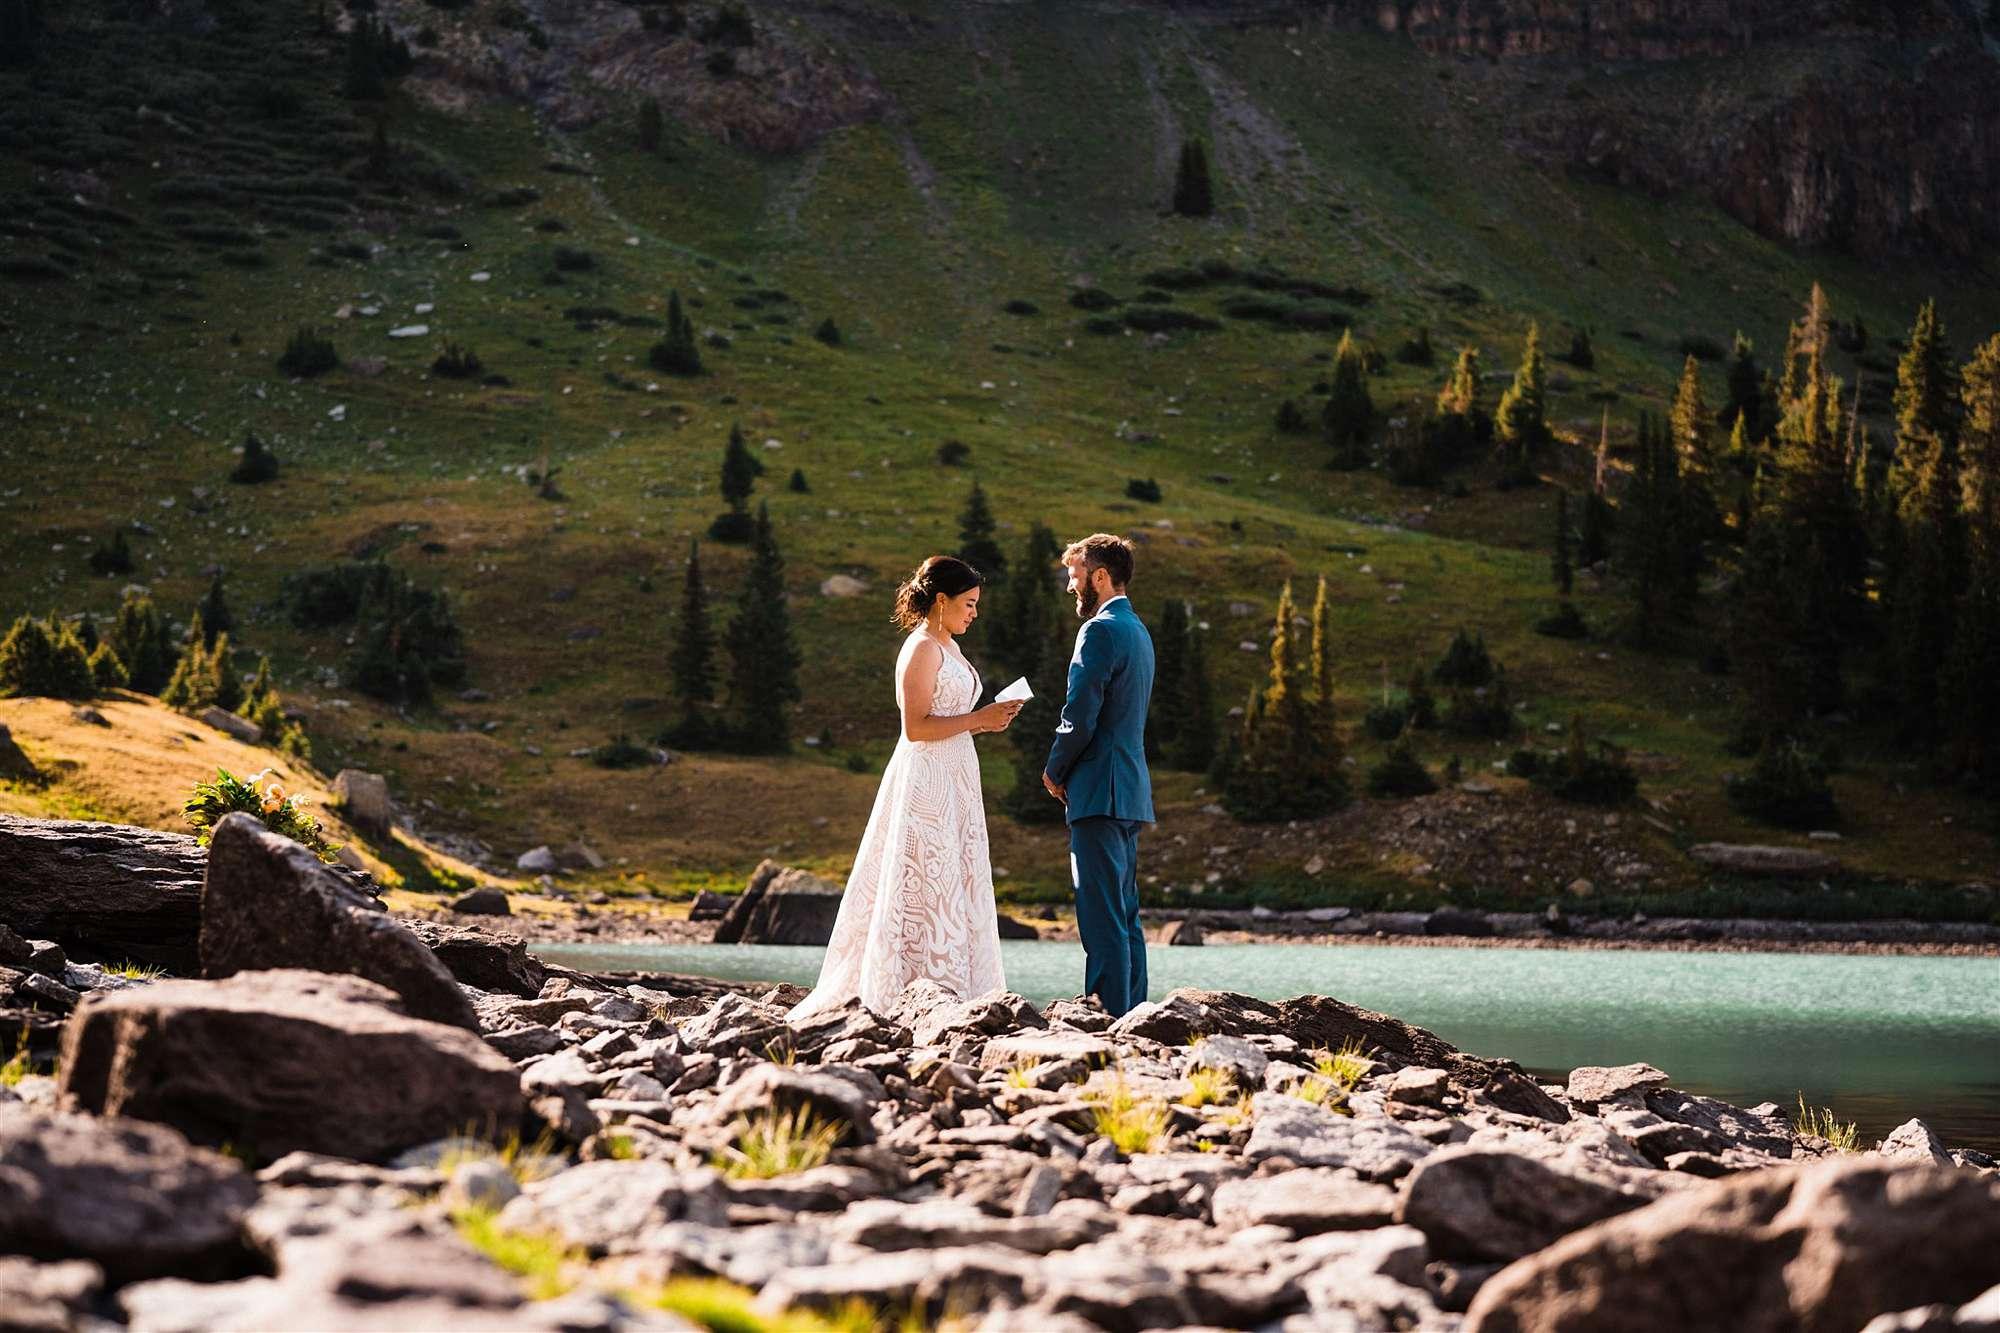 Colorado_Jeeping_Elopement_Emily_Matt_The_Foxes_Photography_0026.jpg